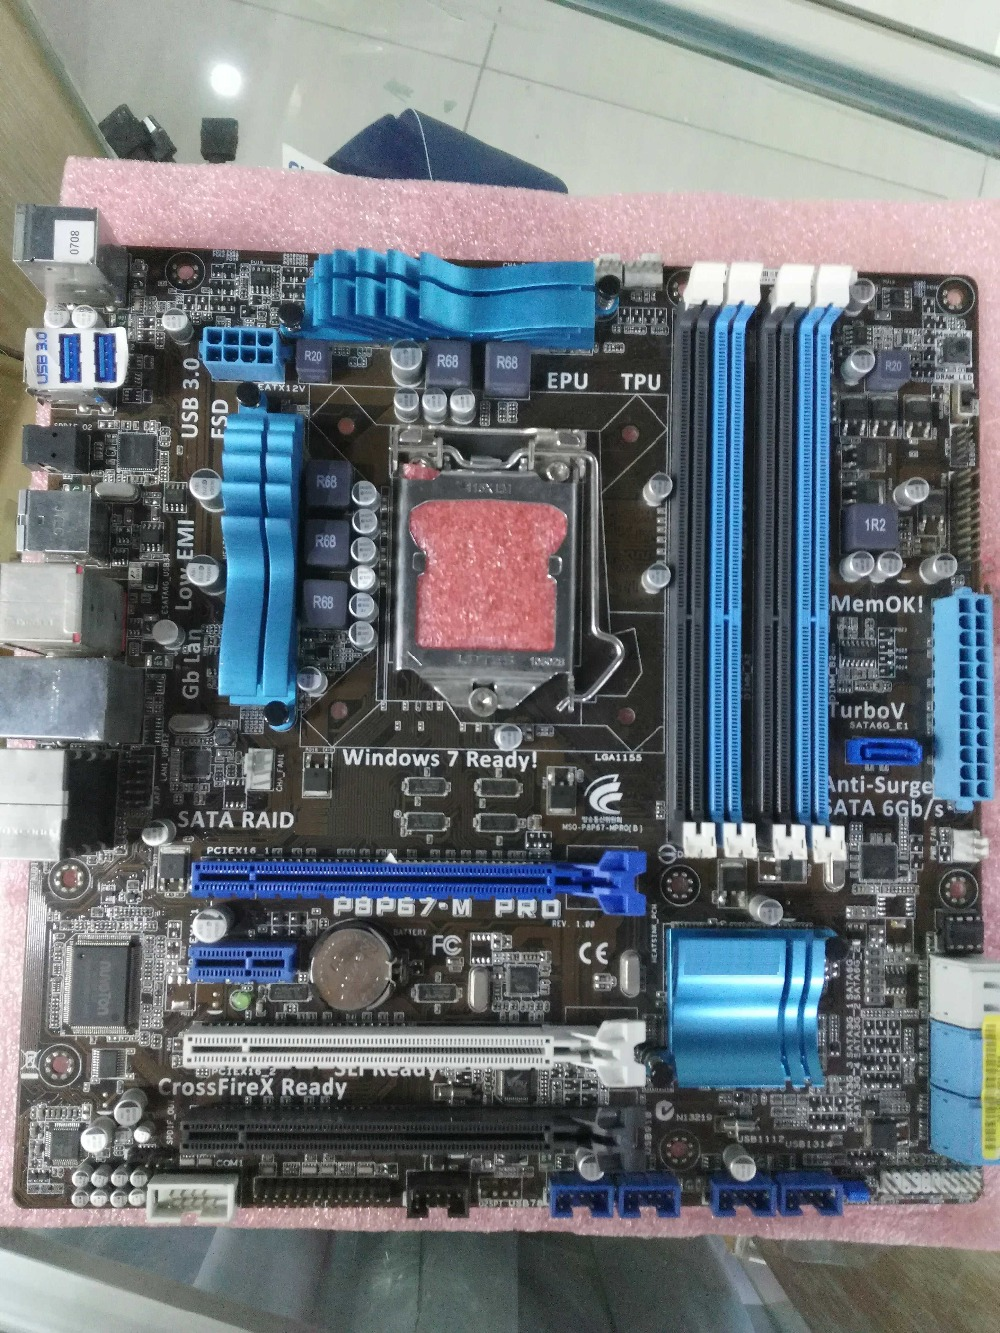 Free shipping original motherboard for P8P67-M PRO DDR3 LGA 1155 boards RAM 32G USB3.0 SATA III  P67 Desktop Motherboard free shipping original motherboard for asus p8p67 le ddr3 lga 1155 ram 32g motherboards sata3 0 usb3 0 mainboard